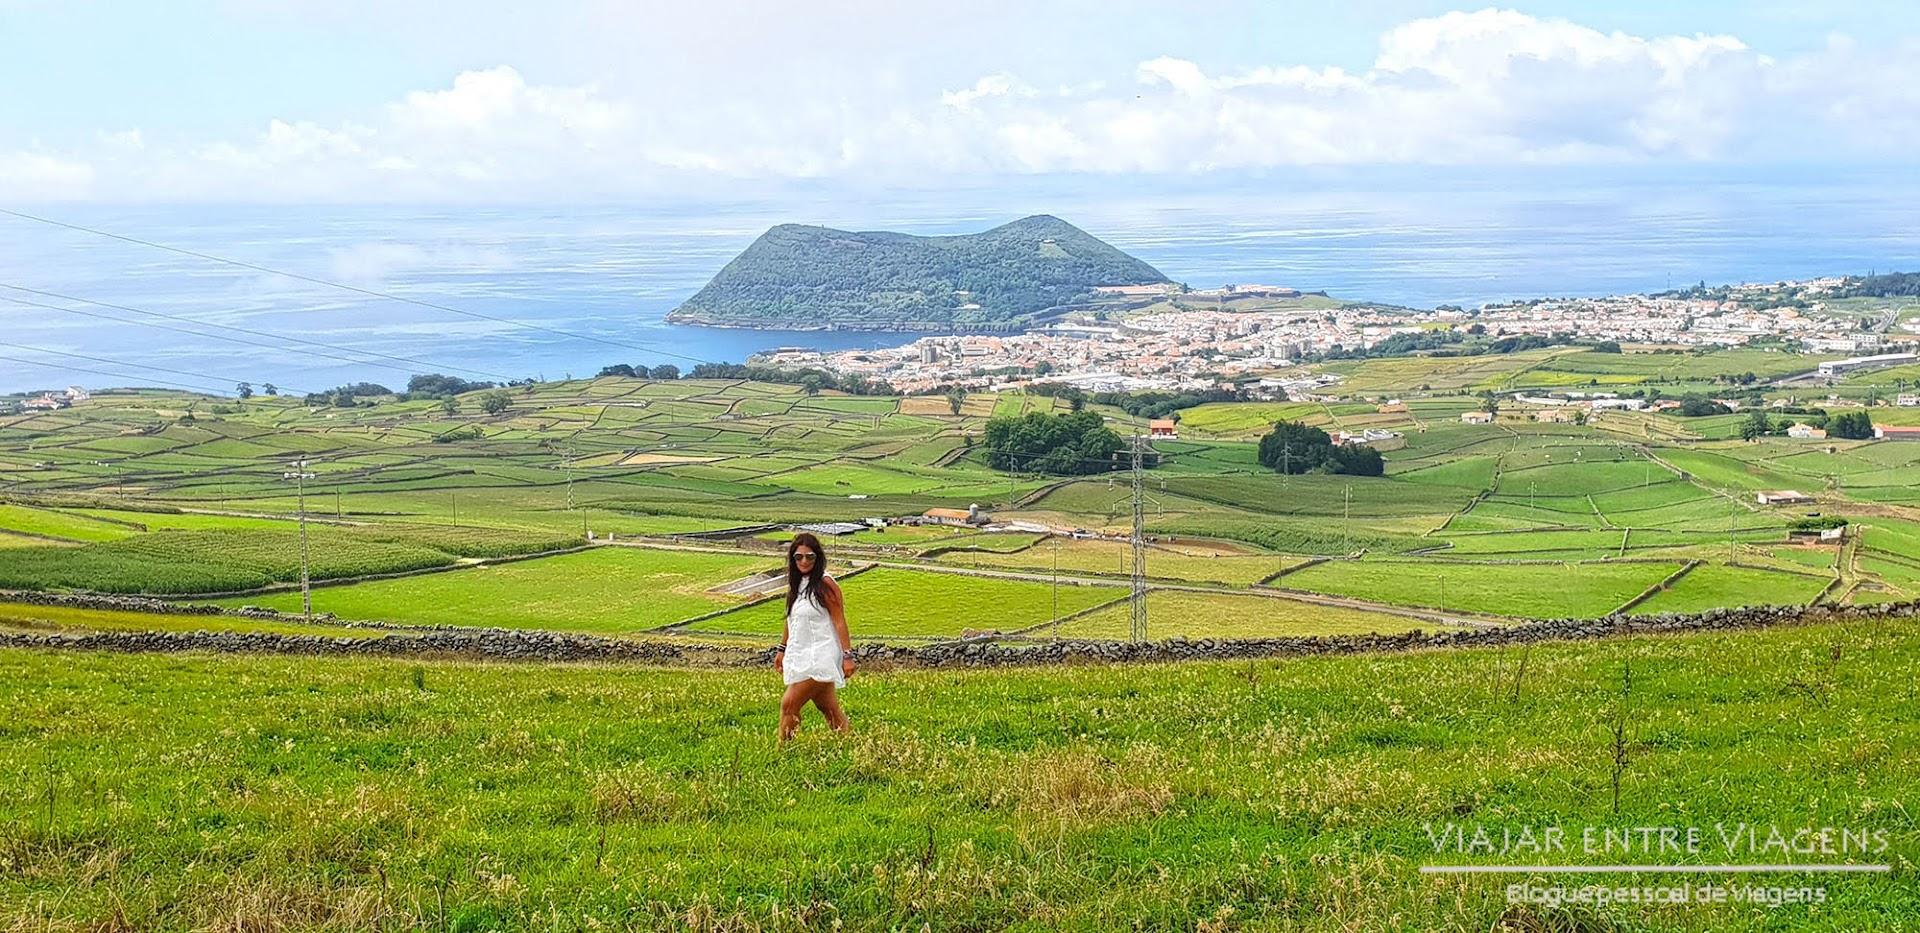 Subir à Serra da Ribeirinha, na ilha Terceira